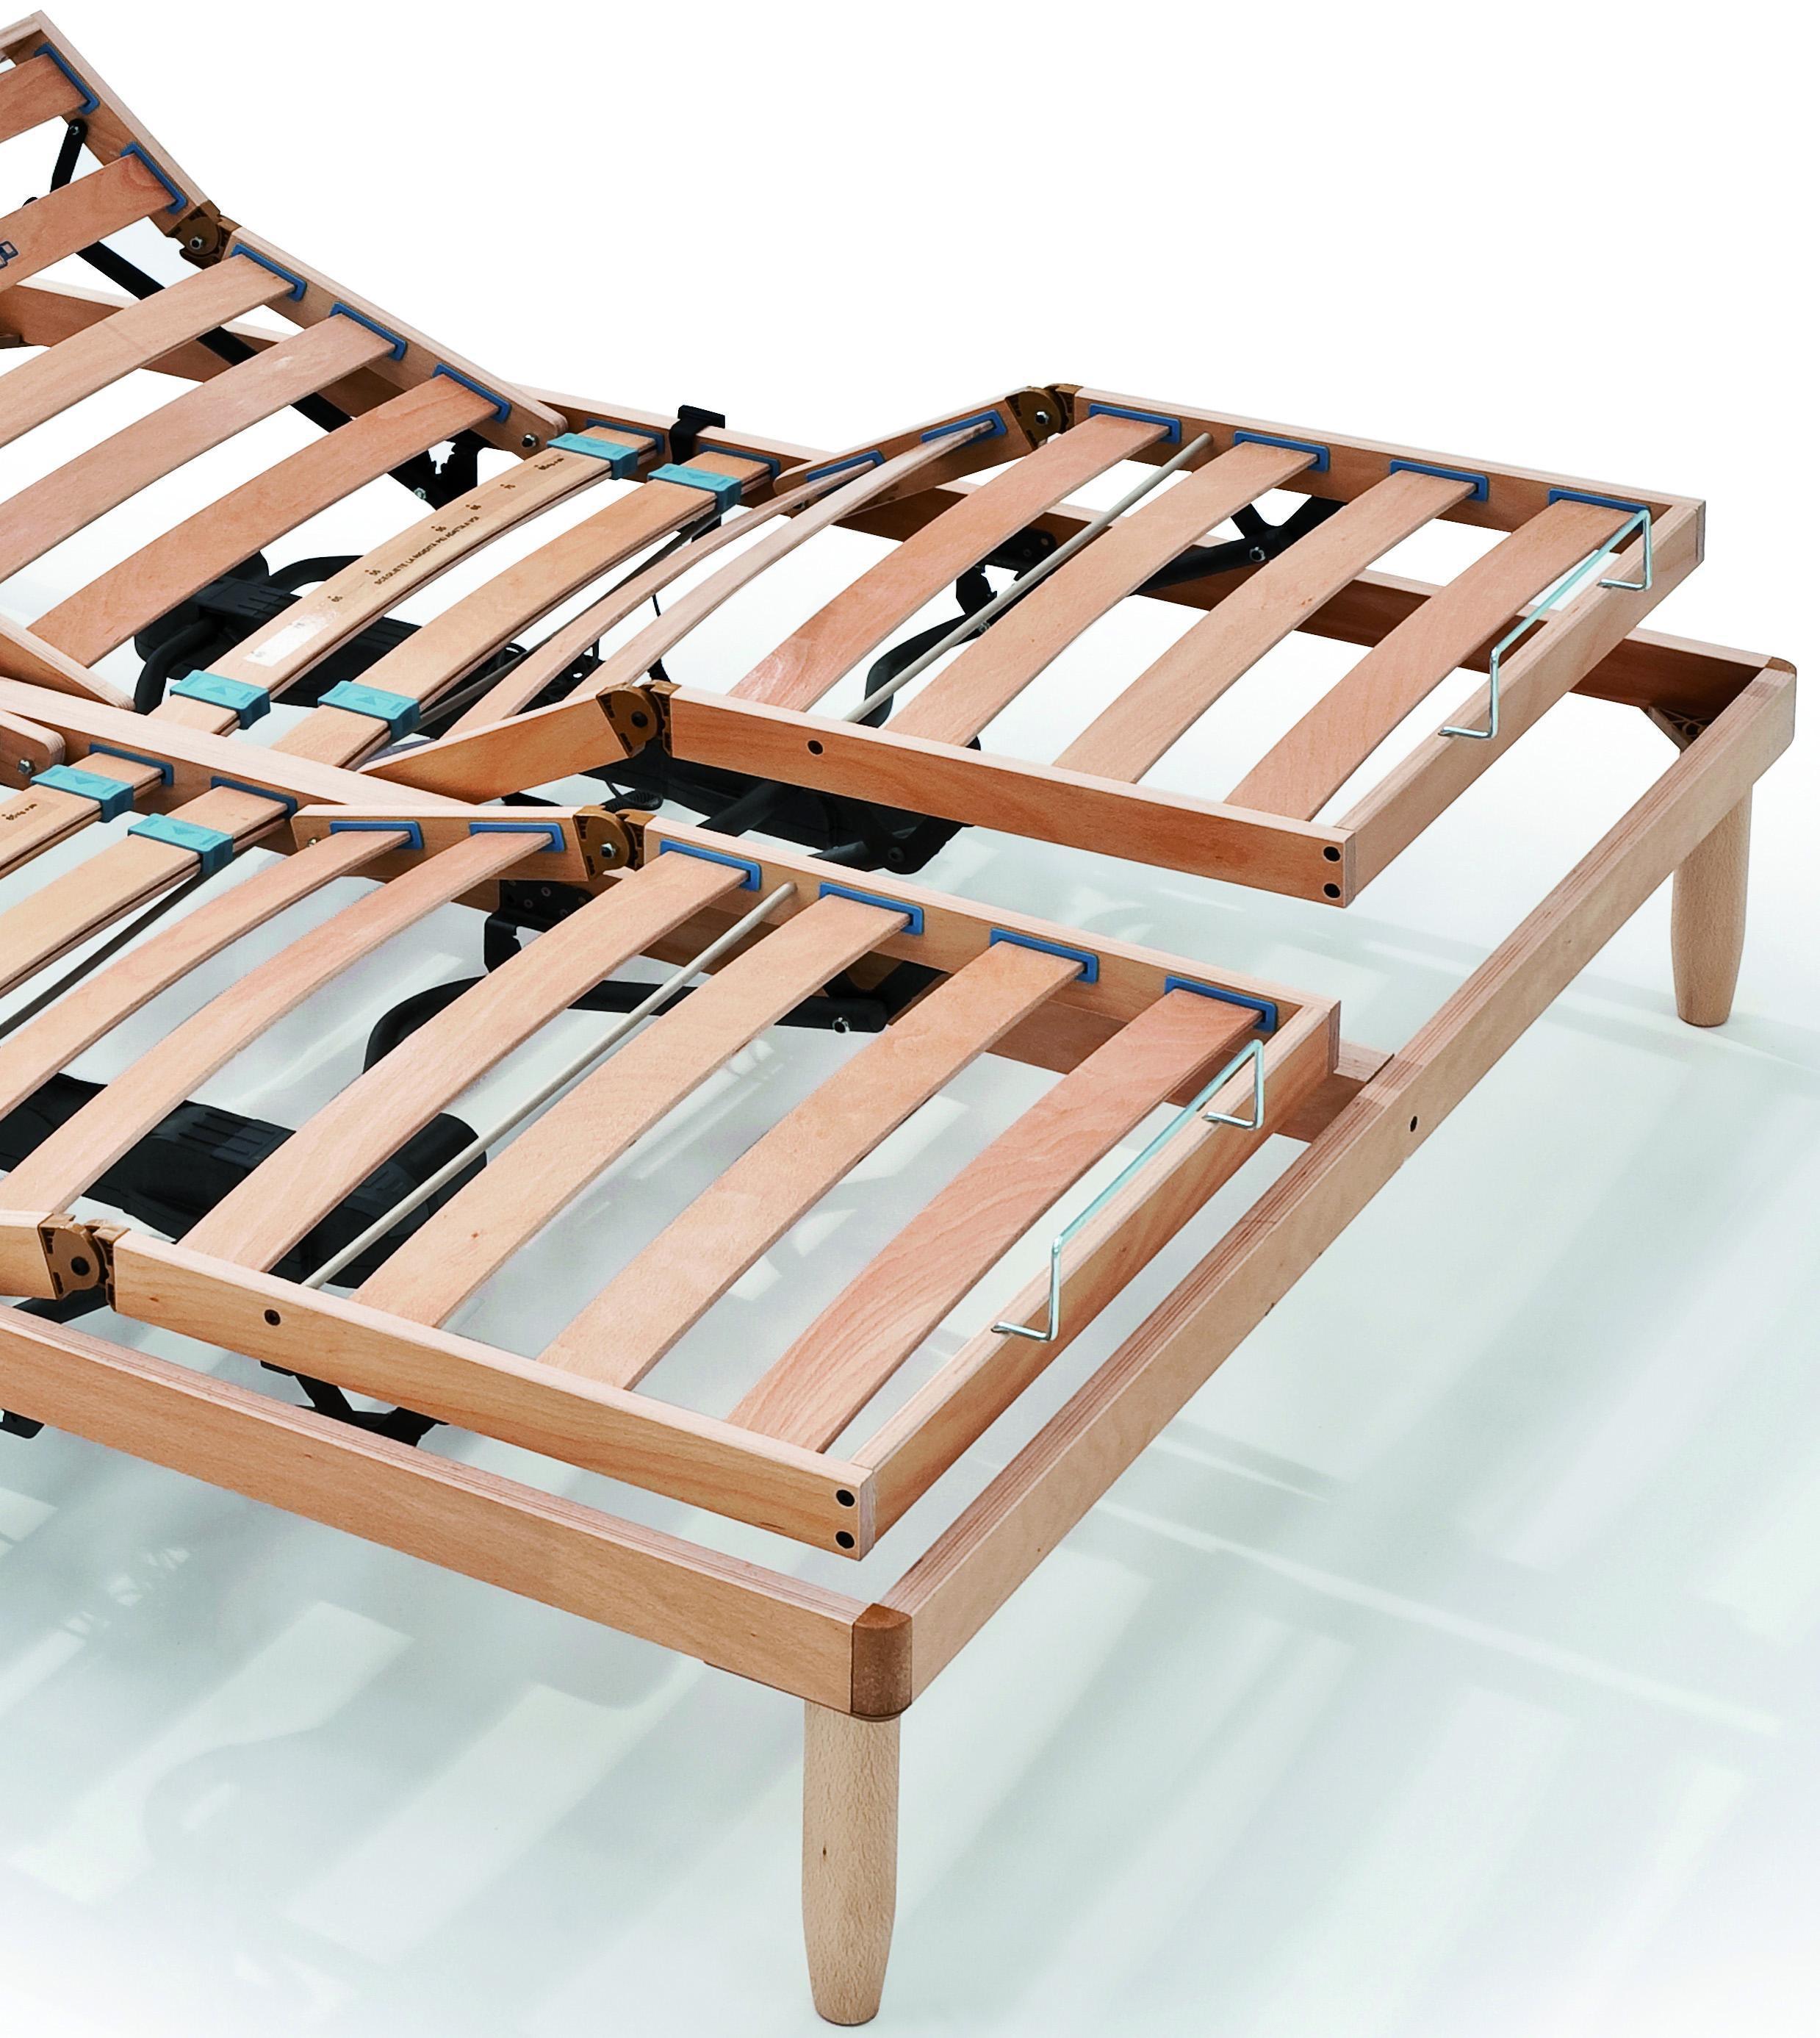 sommier lectrique lattes en bois mouvement ind pendant orange ebay. Black Bedroom Furniture Sets. Home Design Ideas